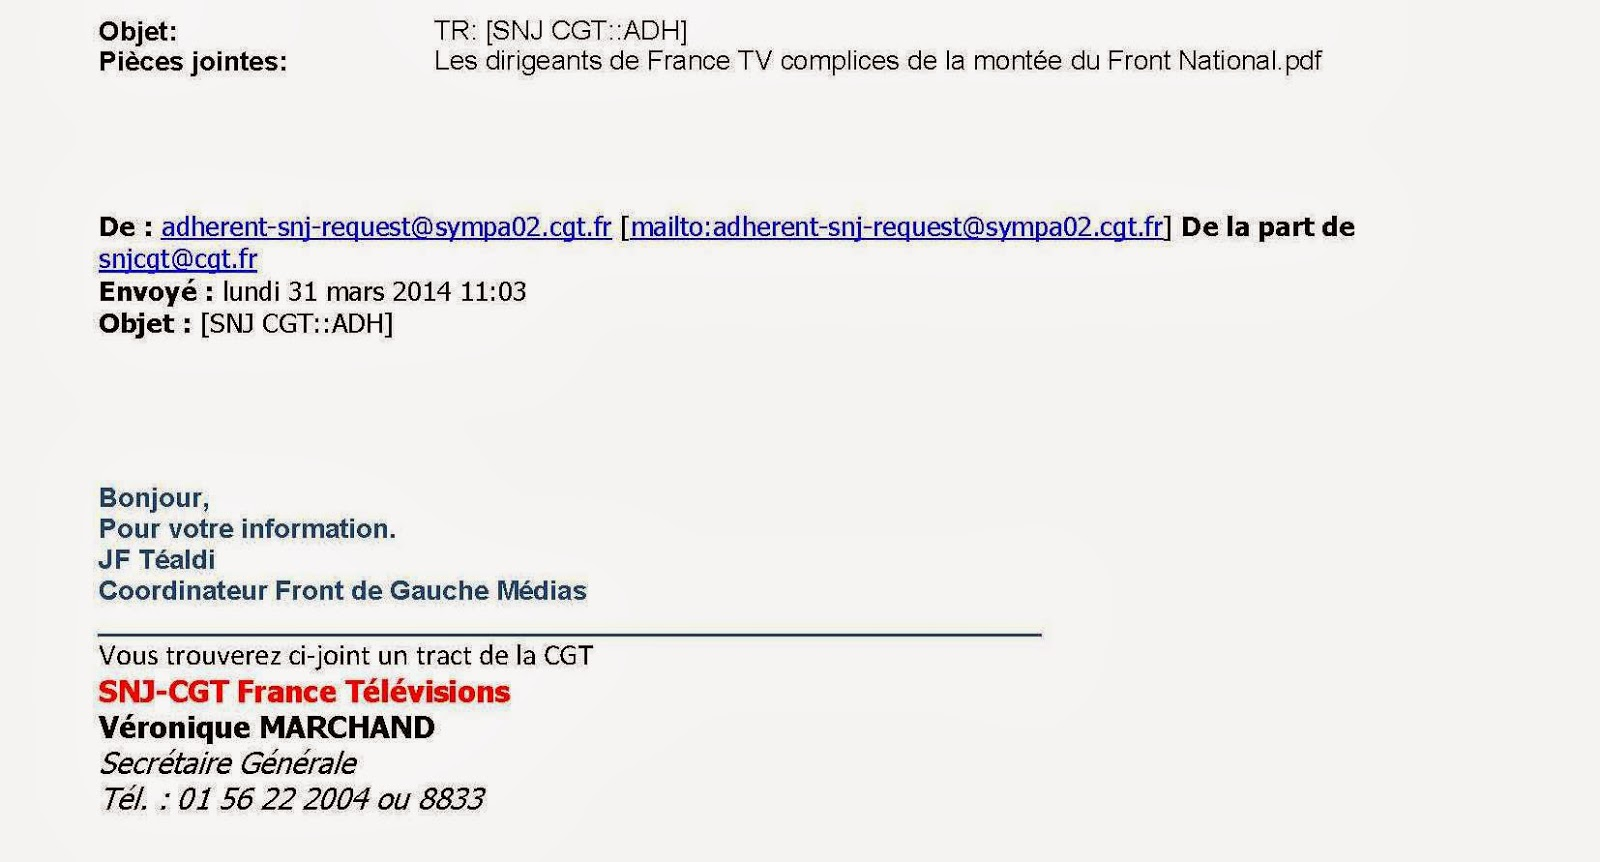 Le Blog CGC des Média: 30 mars 2014